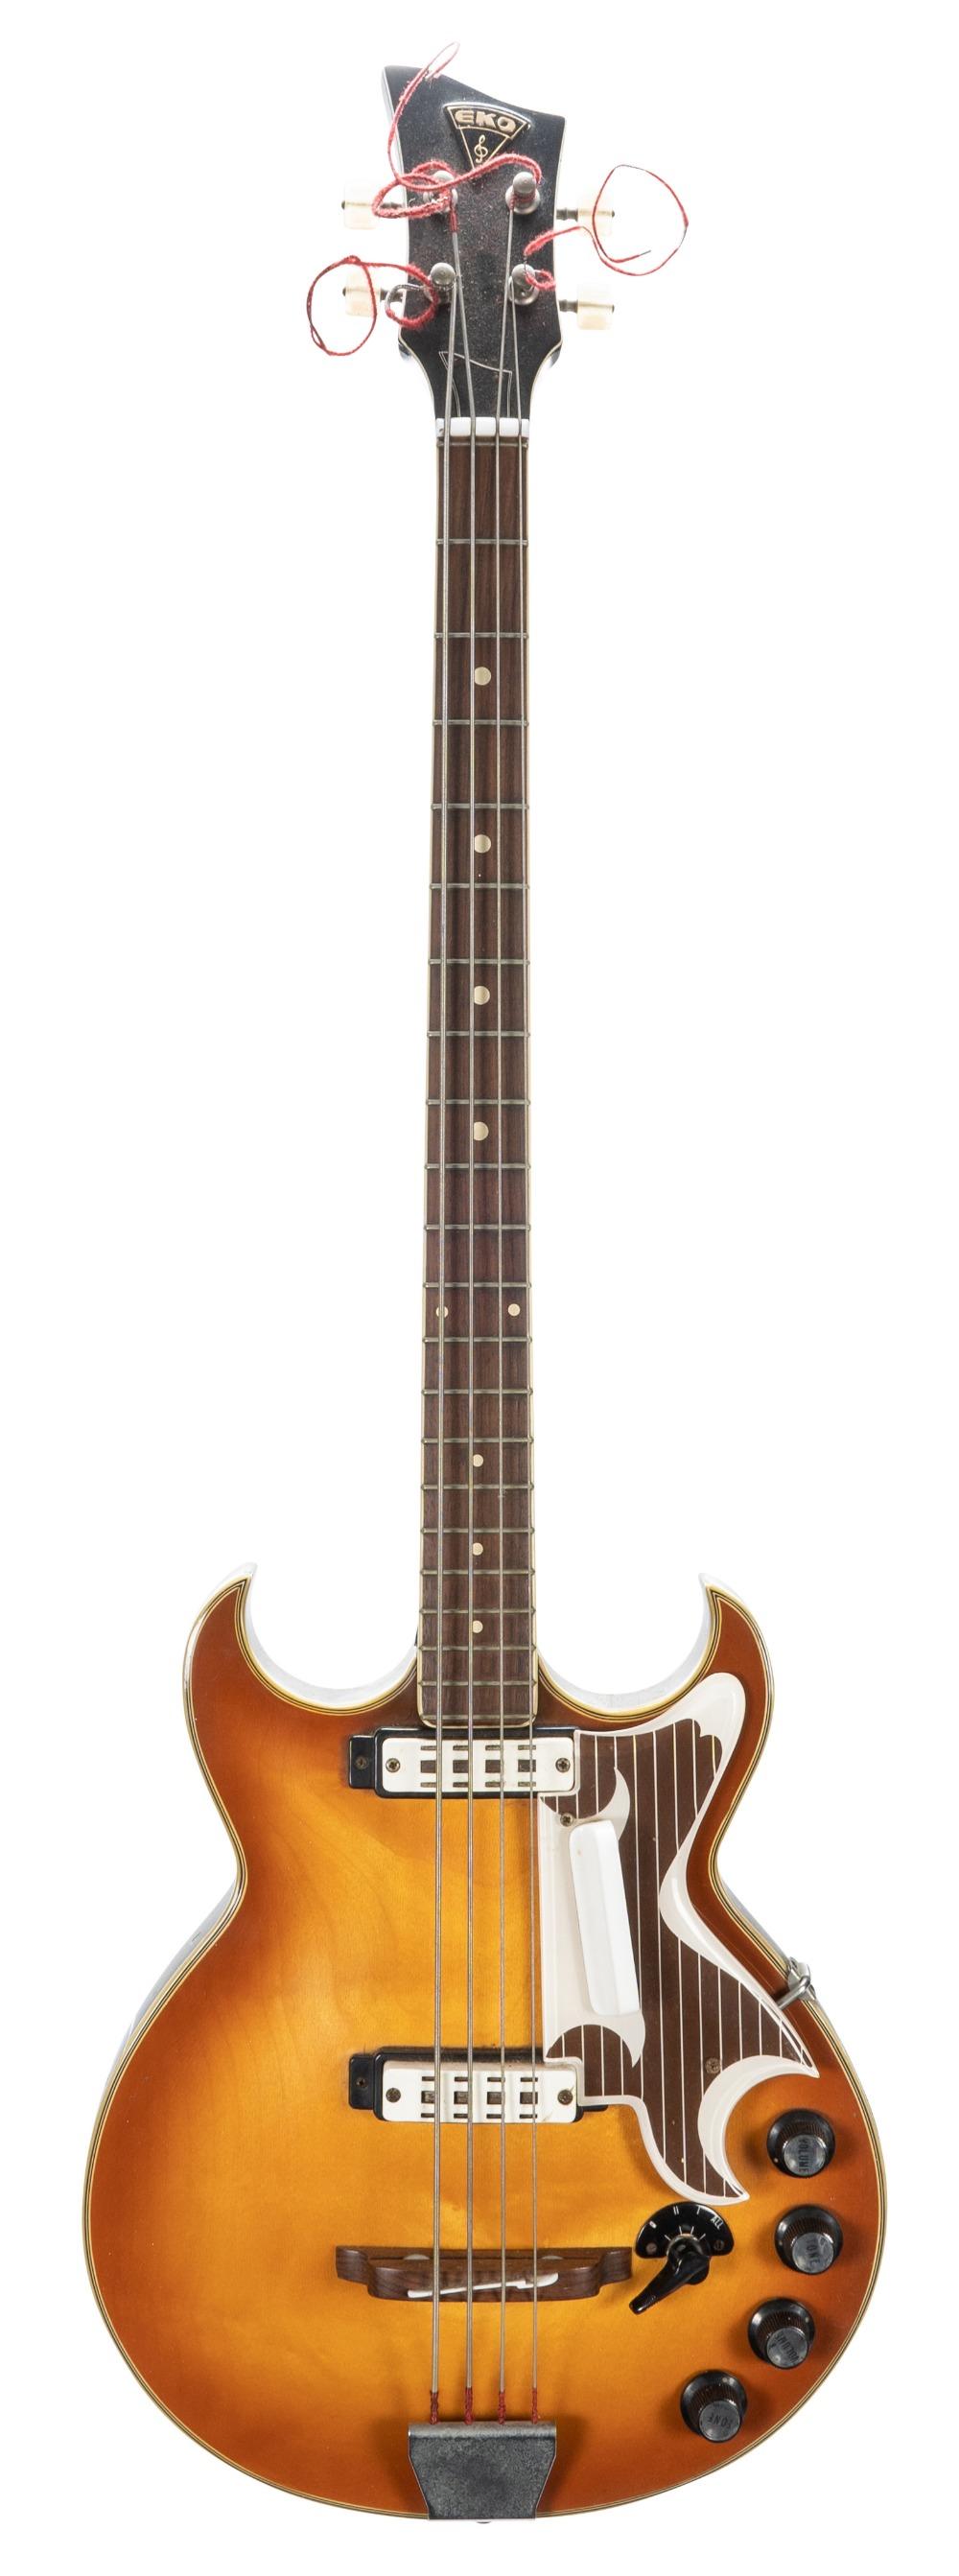 Lot 27 - 1960s Eko 960/2 Florentine bass guitar, made in Italy; Finish: amber burst, various blemishes/